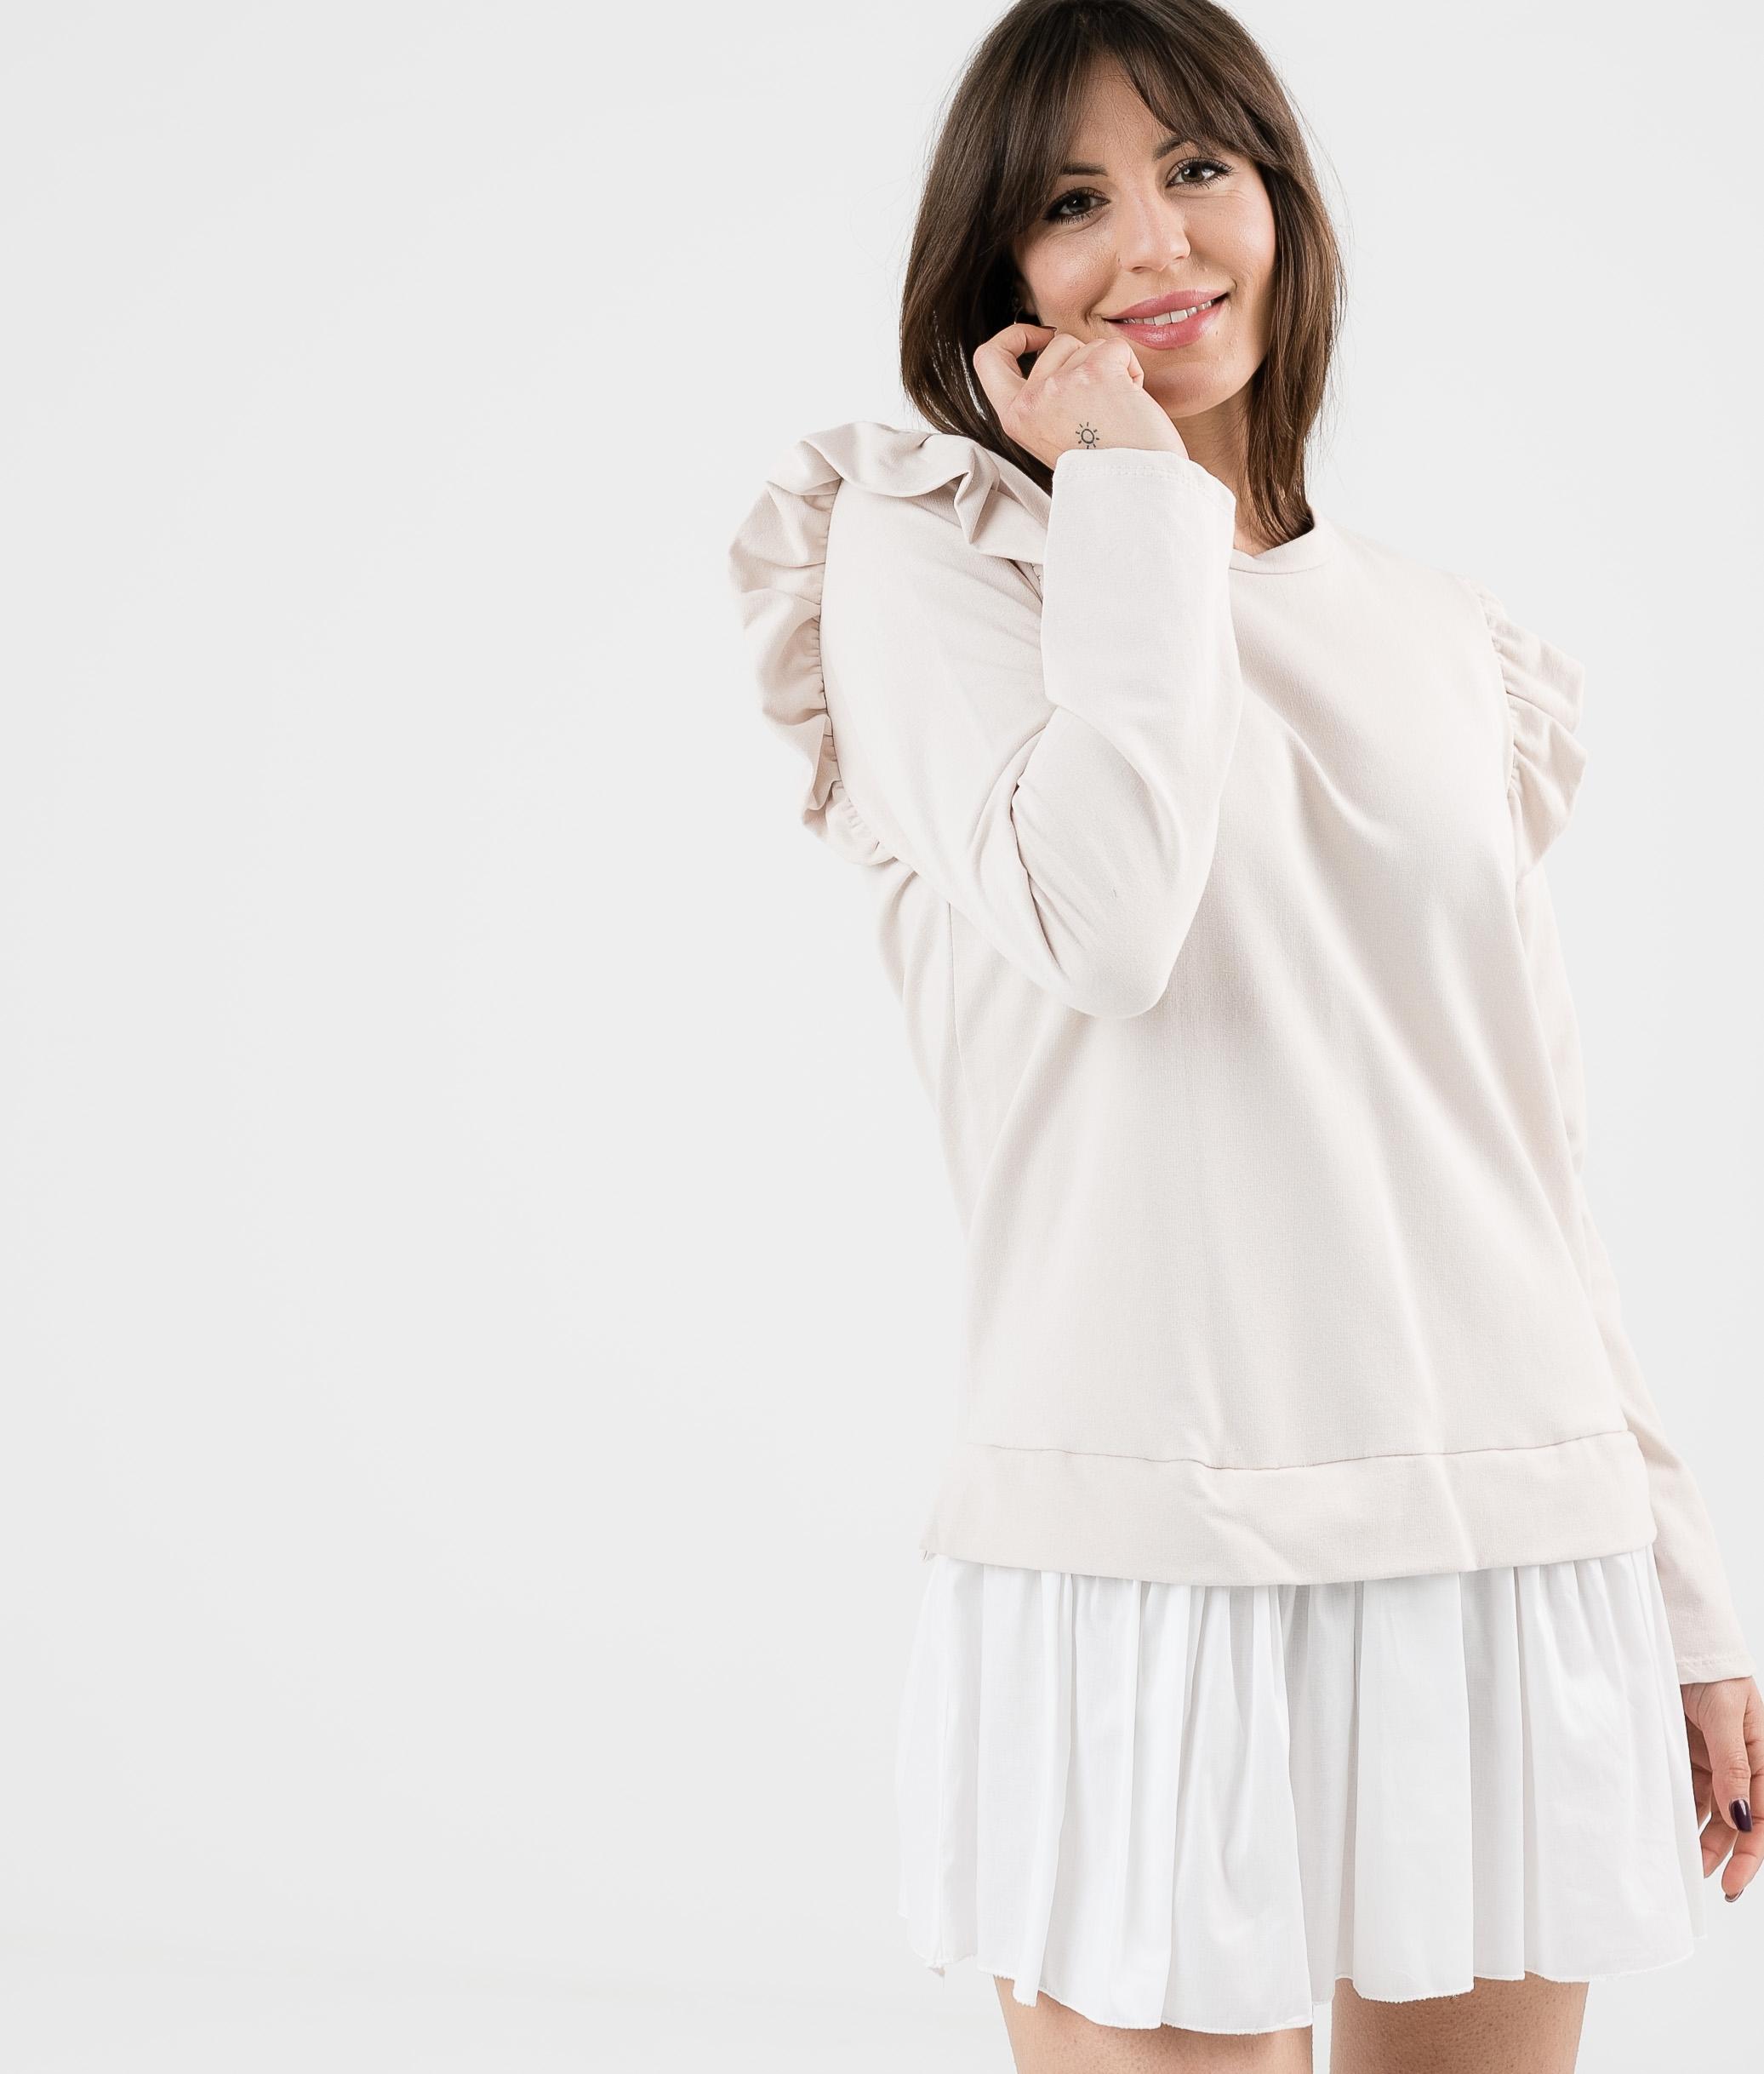 KATPUM DRESS - BEIGE